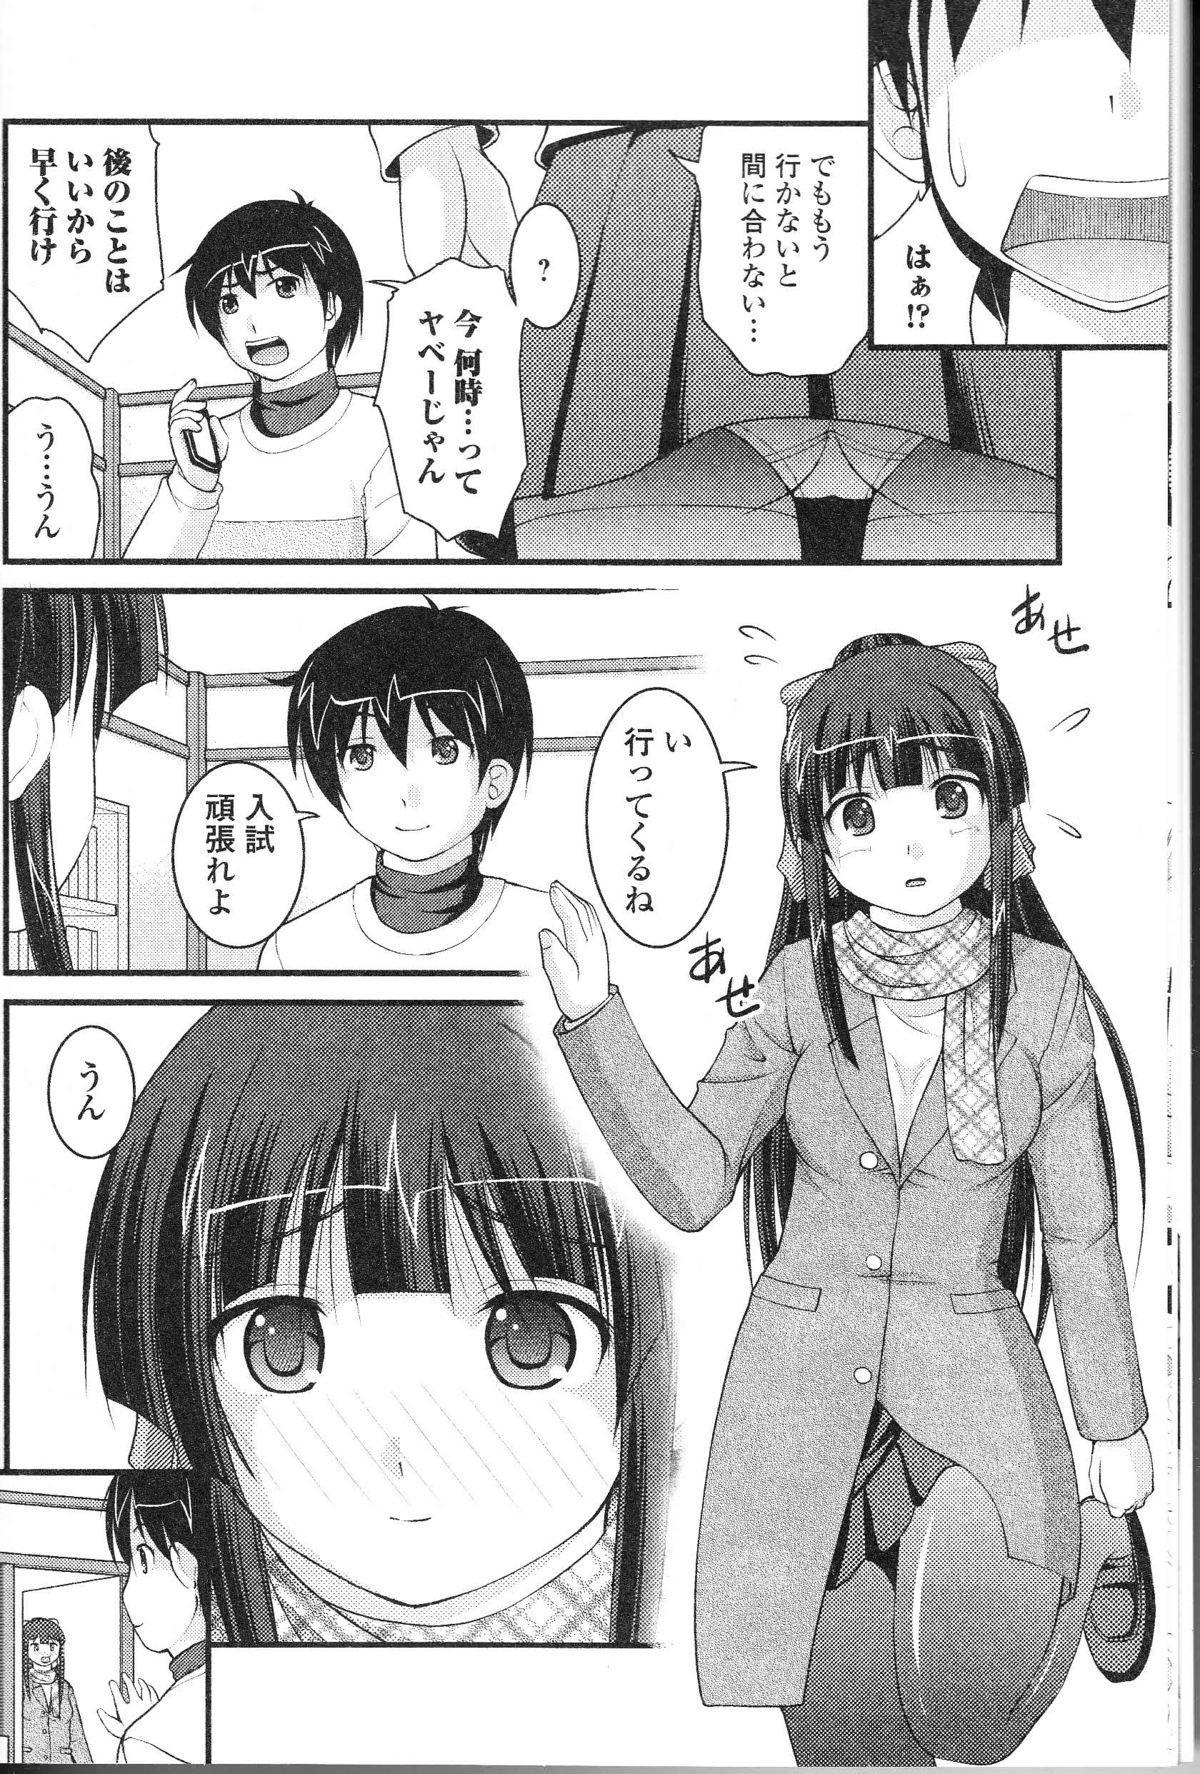 Nozoite wa Ikenai 9 - Do Not Peep! 9 8